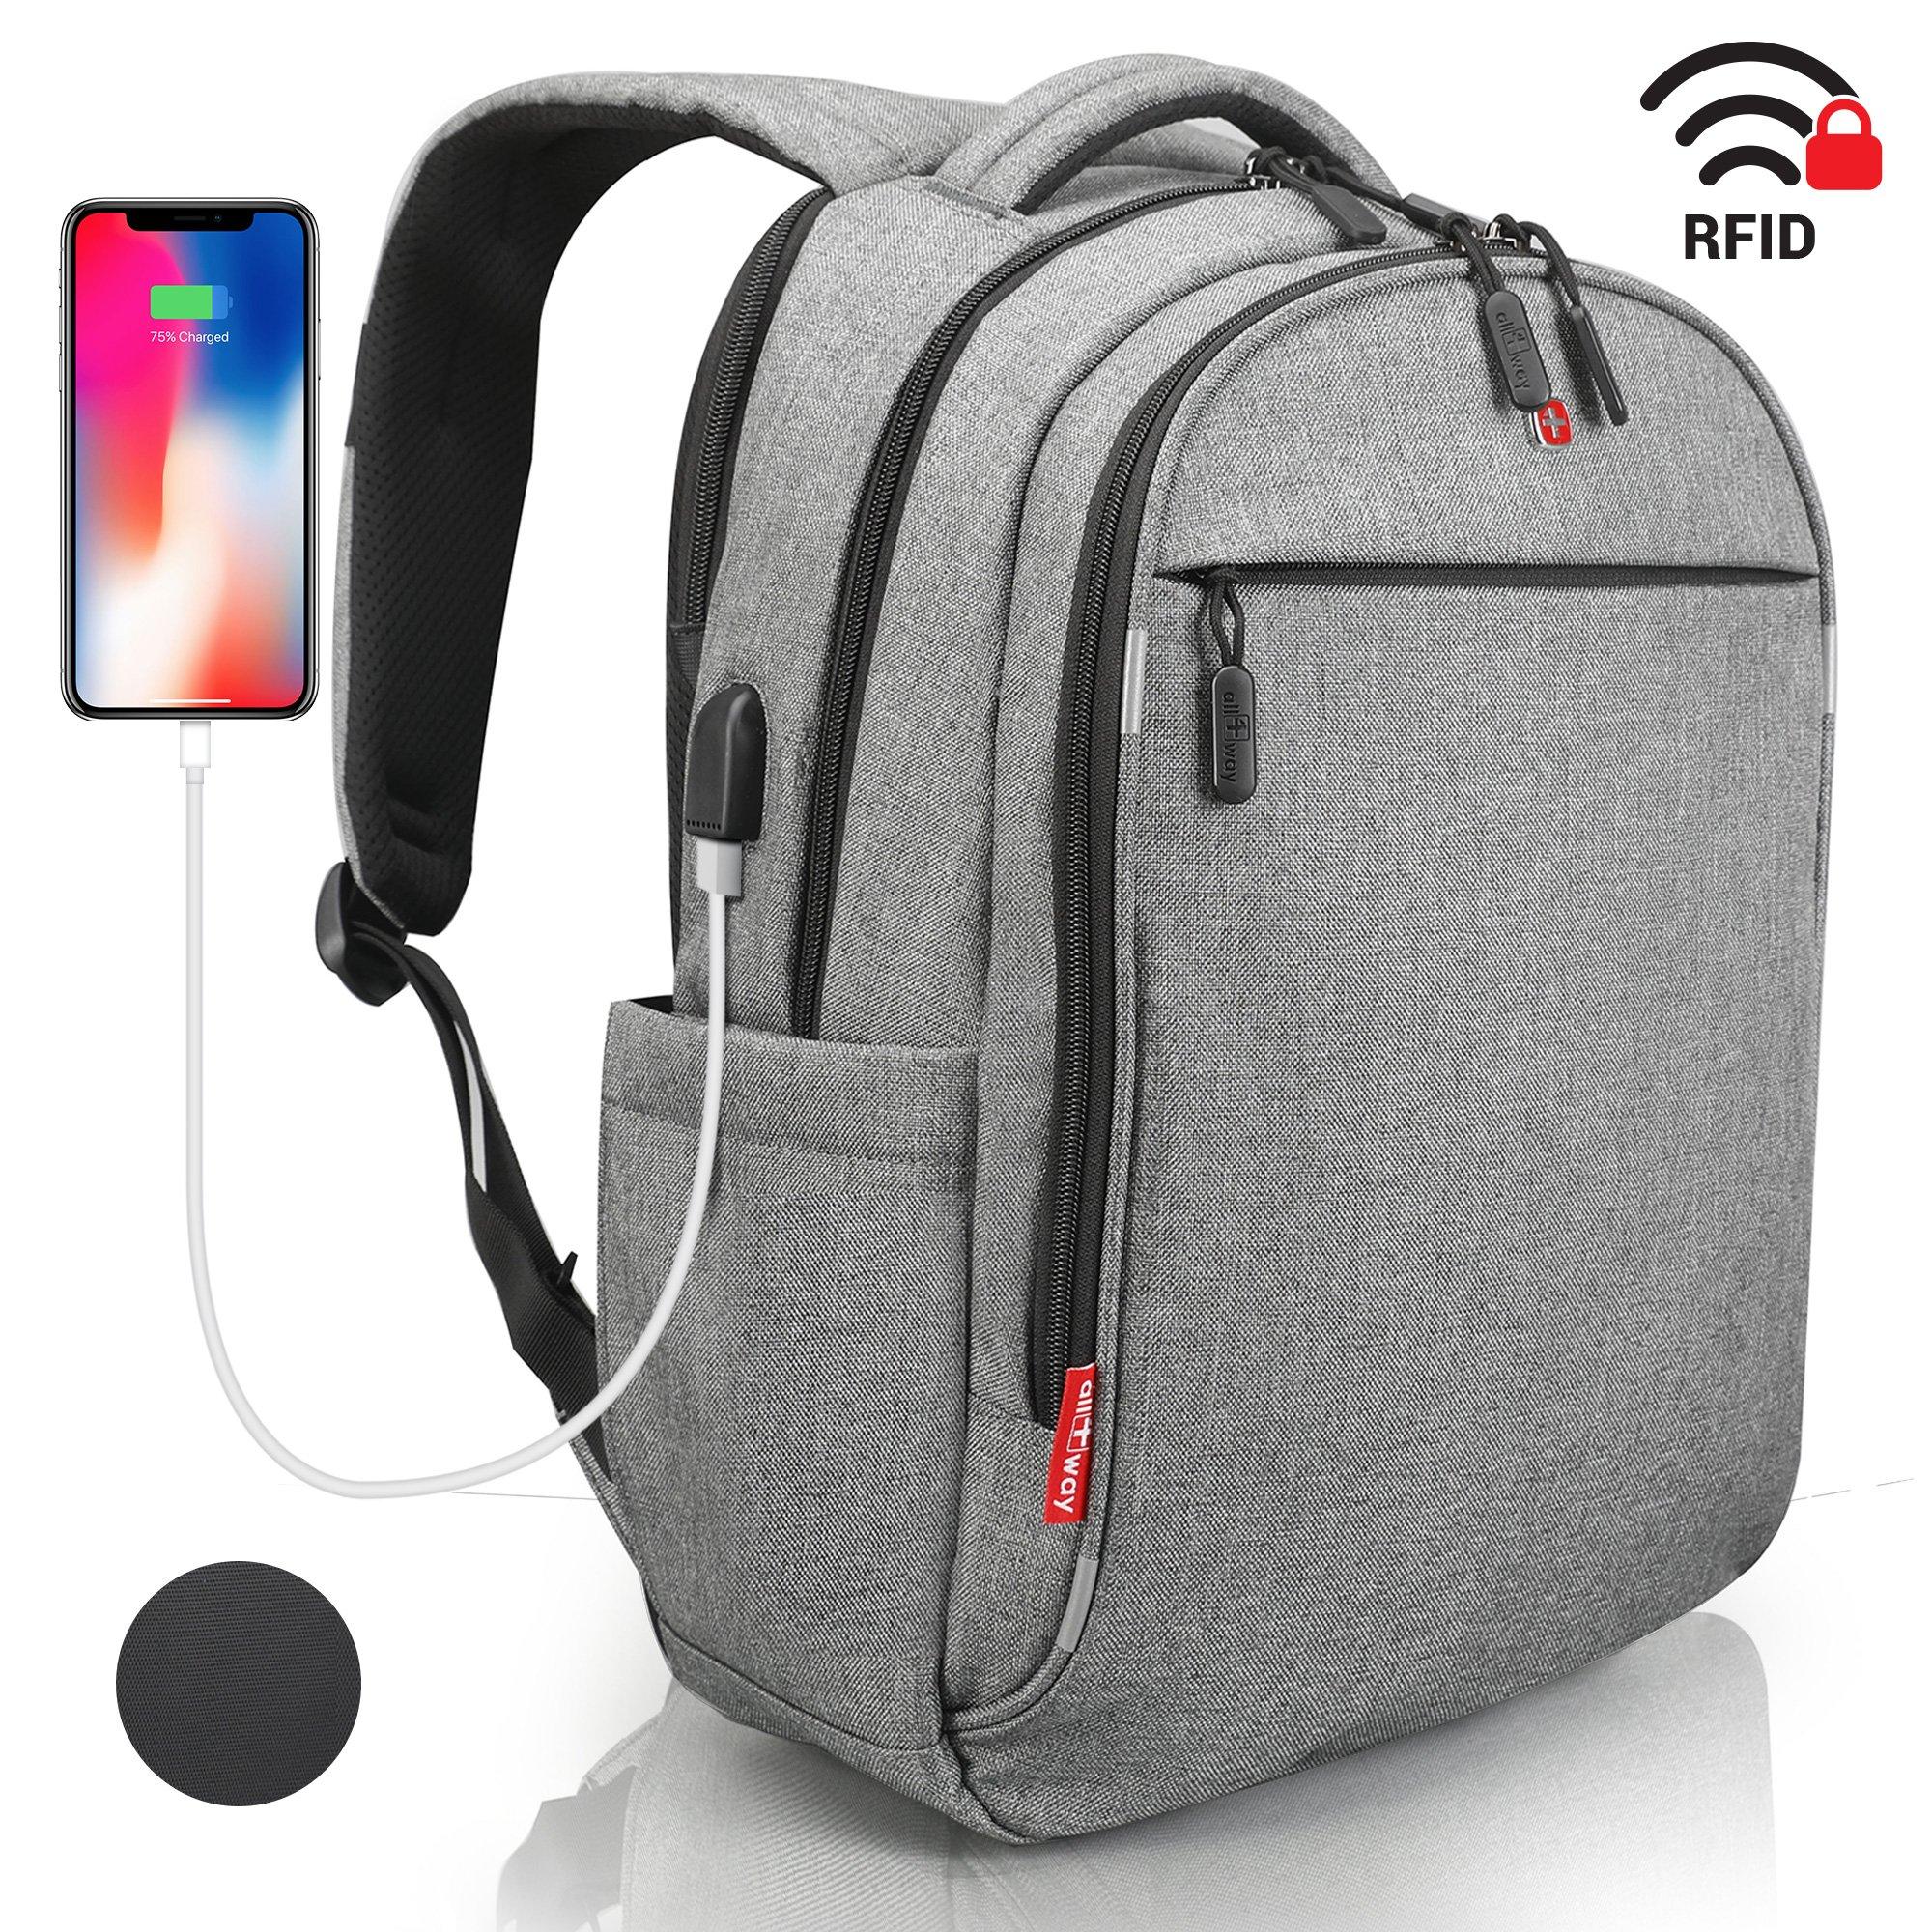 Grey Waterproof USB RFID Backpack - Anti Theft Laptop Travel Backpack - SWISS Design - Business College School Backpack - Backpack for Men Women 15.6 inch